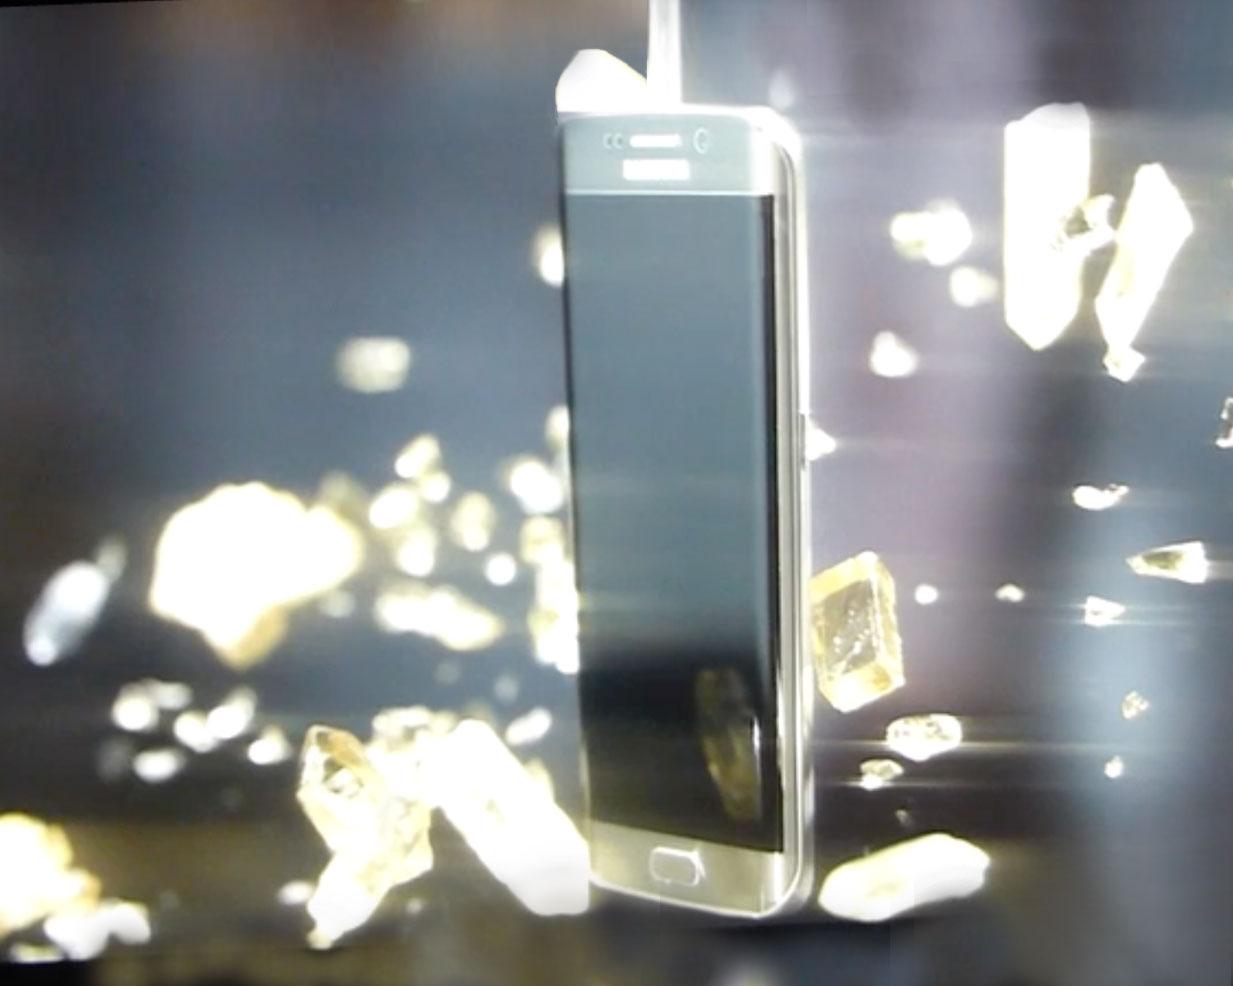 SamsungFront2